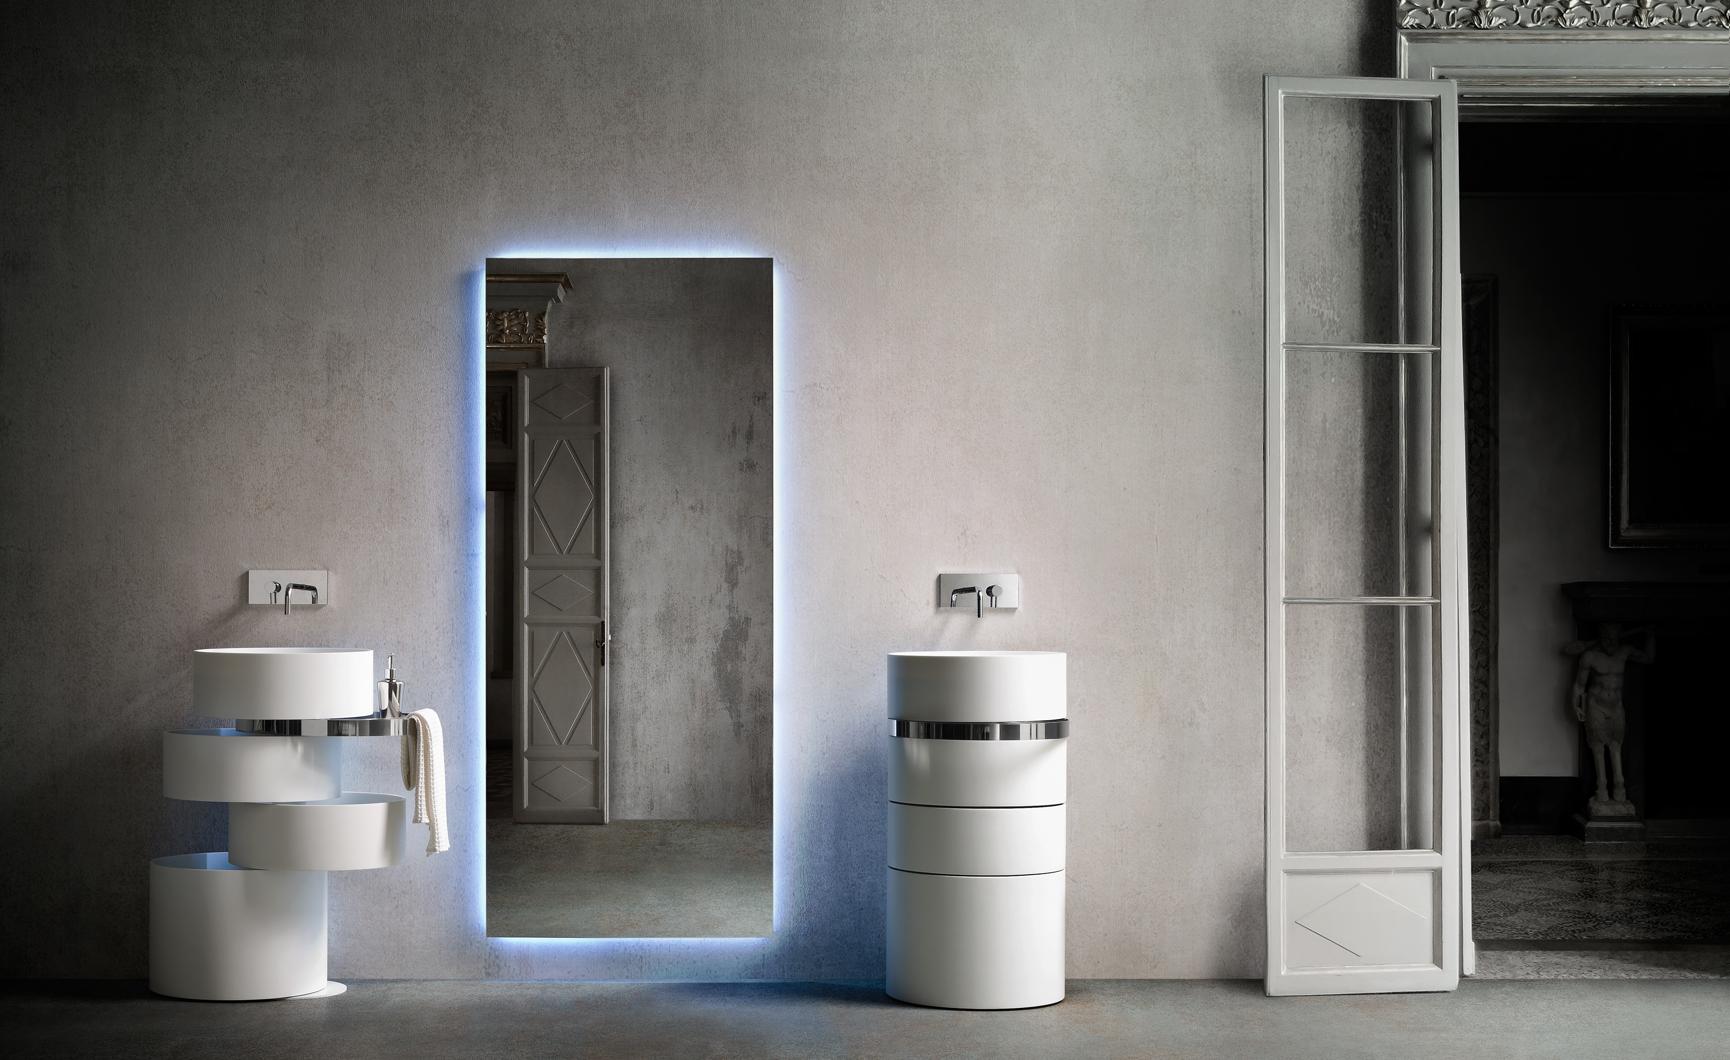 Design badkamermeubel met ingebouwde wastafel - Nieuws - ShowHome.nl